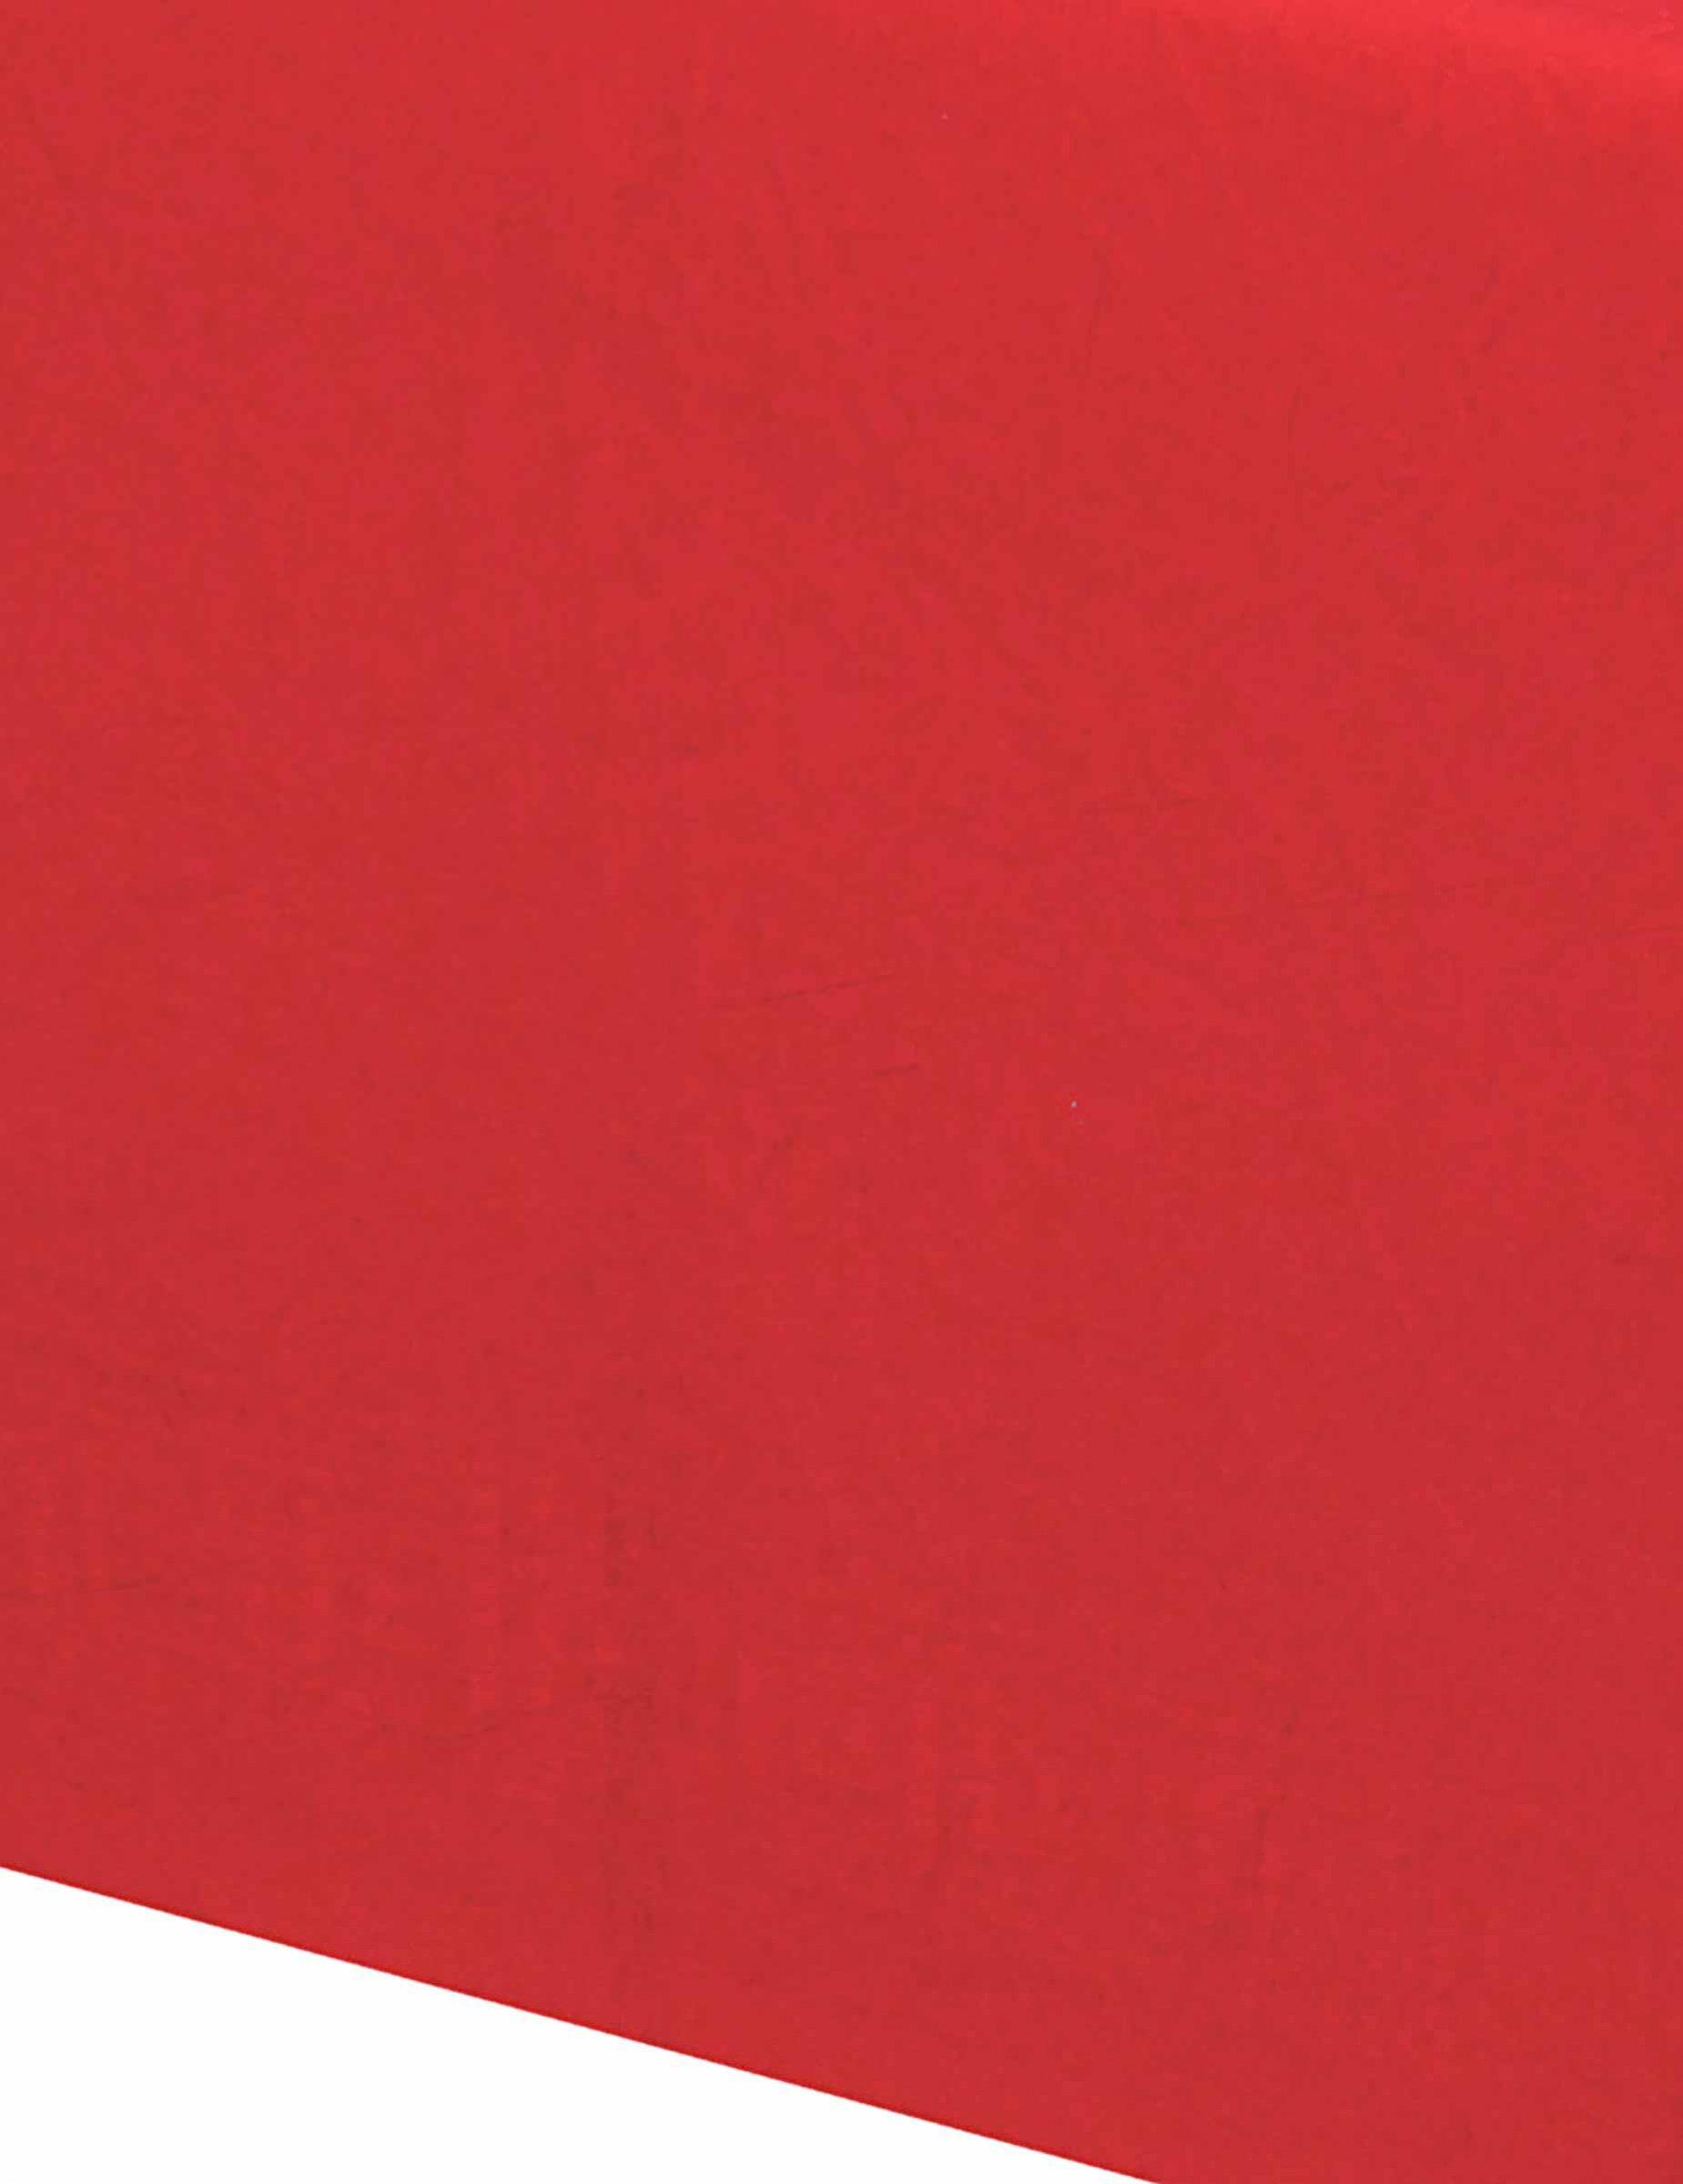 papier tischdecke party deko rot 280x140cm g nstige faschings partydeko zubeh r bei karneval. Black Bedroom Furniture Sets. Home Design Ideas